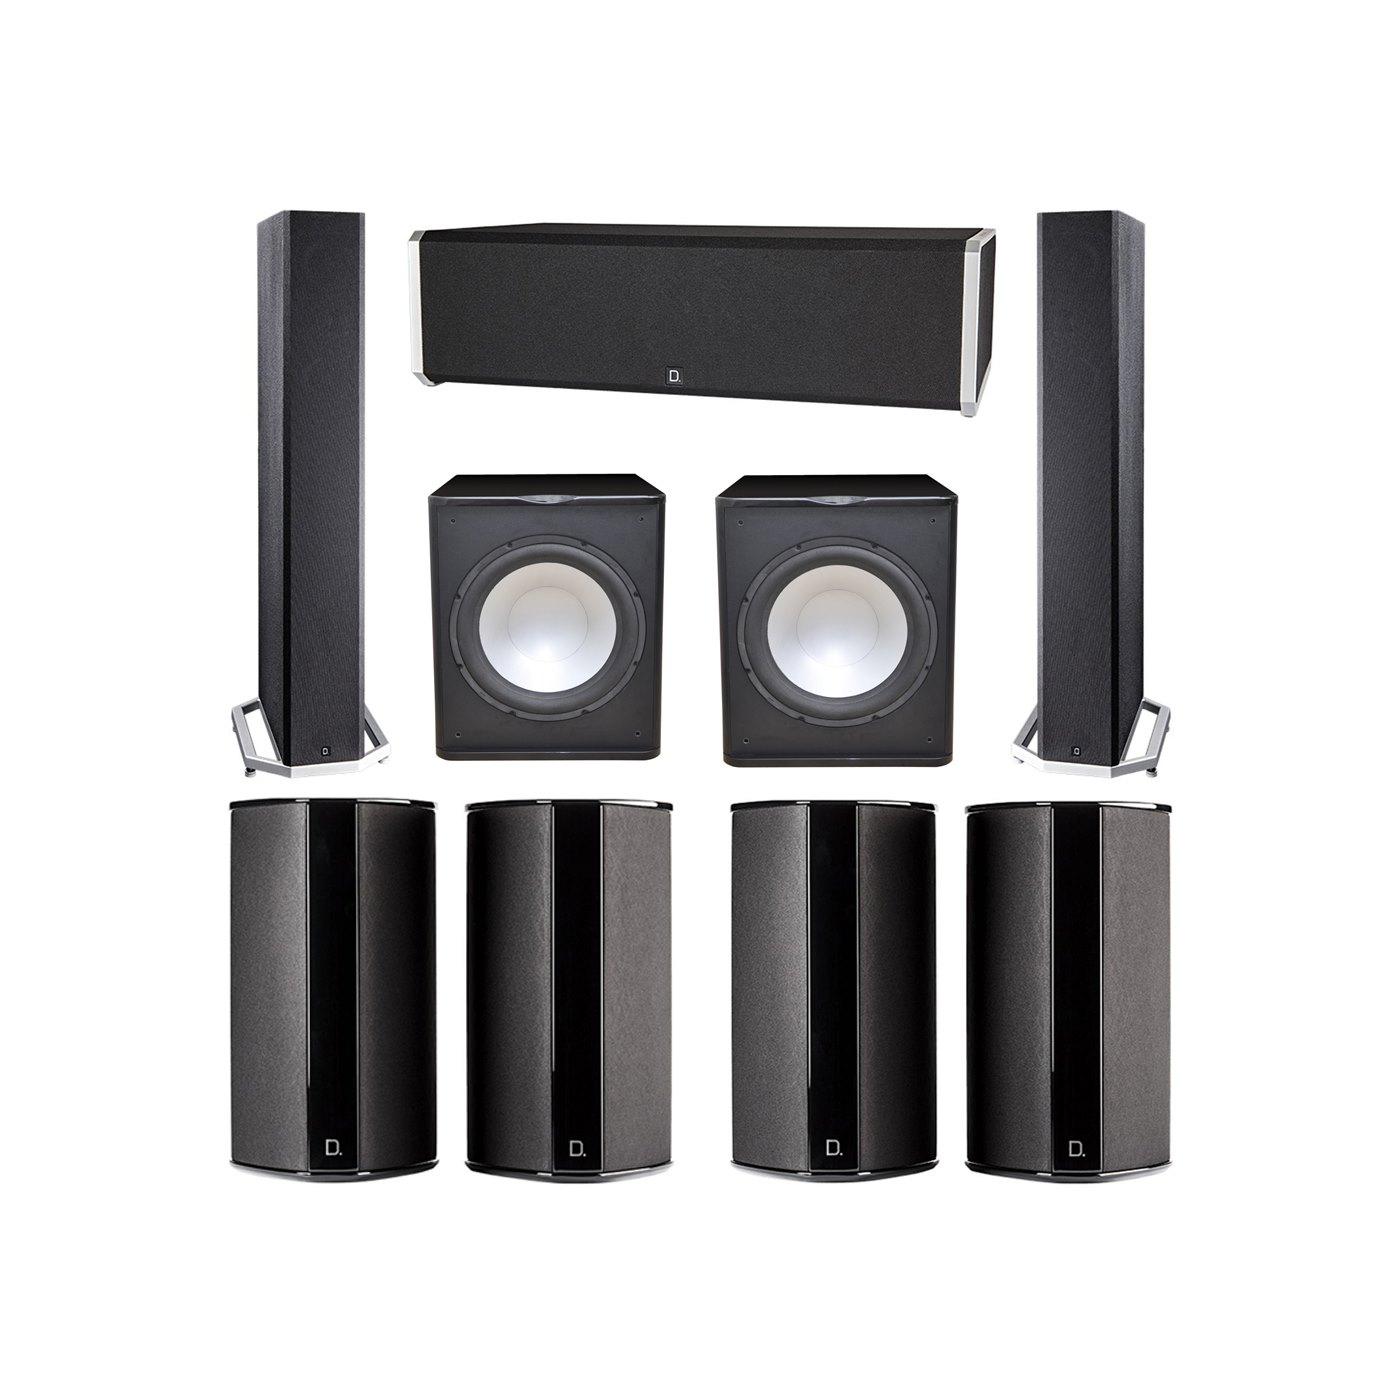 Definitive Technology 7.2 System with 2 BP9040 Tower Speakers, 1 CS9040 Center Channel Speaker, 4 SR9080 Surround Speaker, 2 Premier Acoustic PA-150 Subwoofer